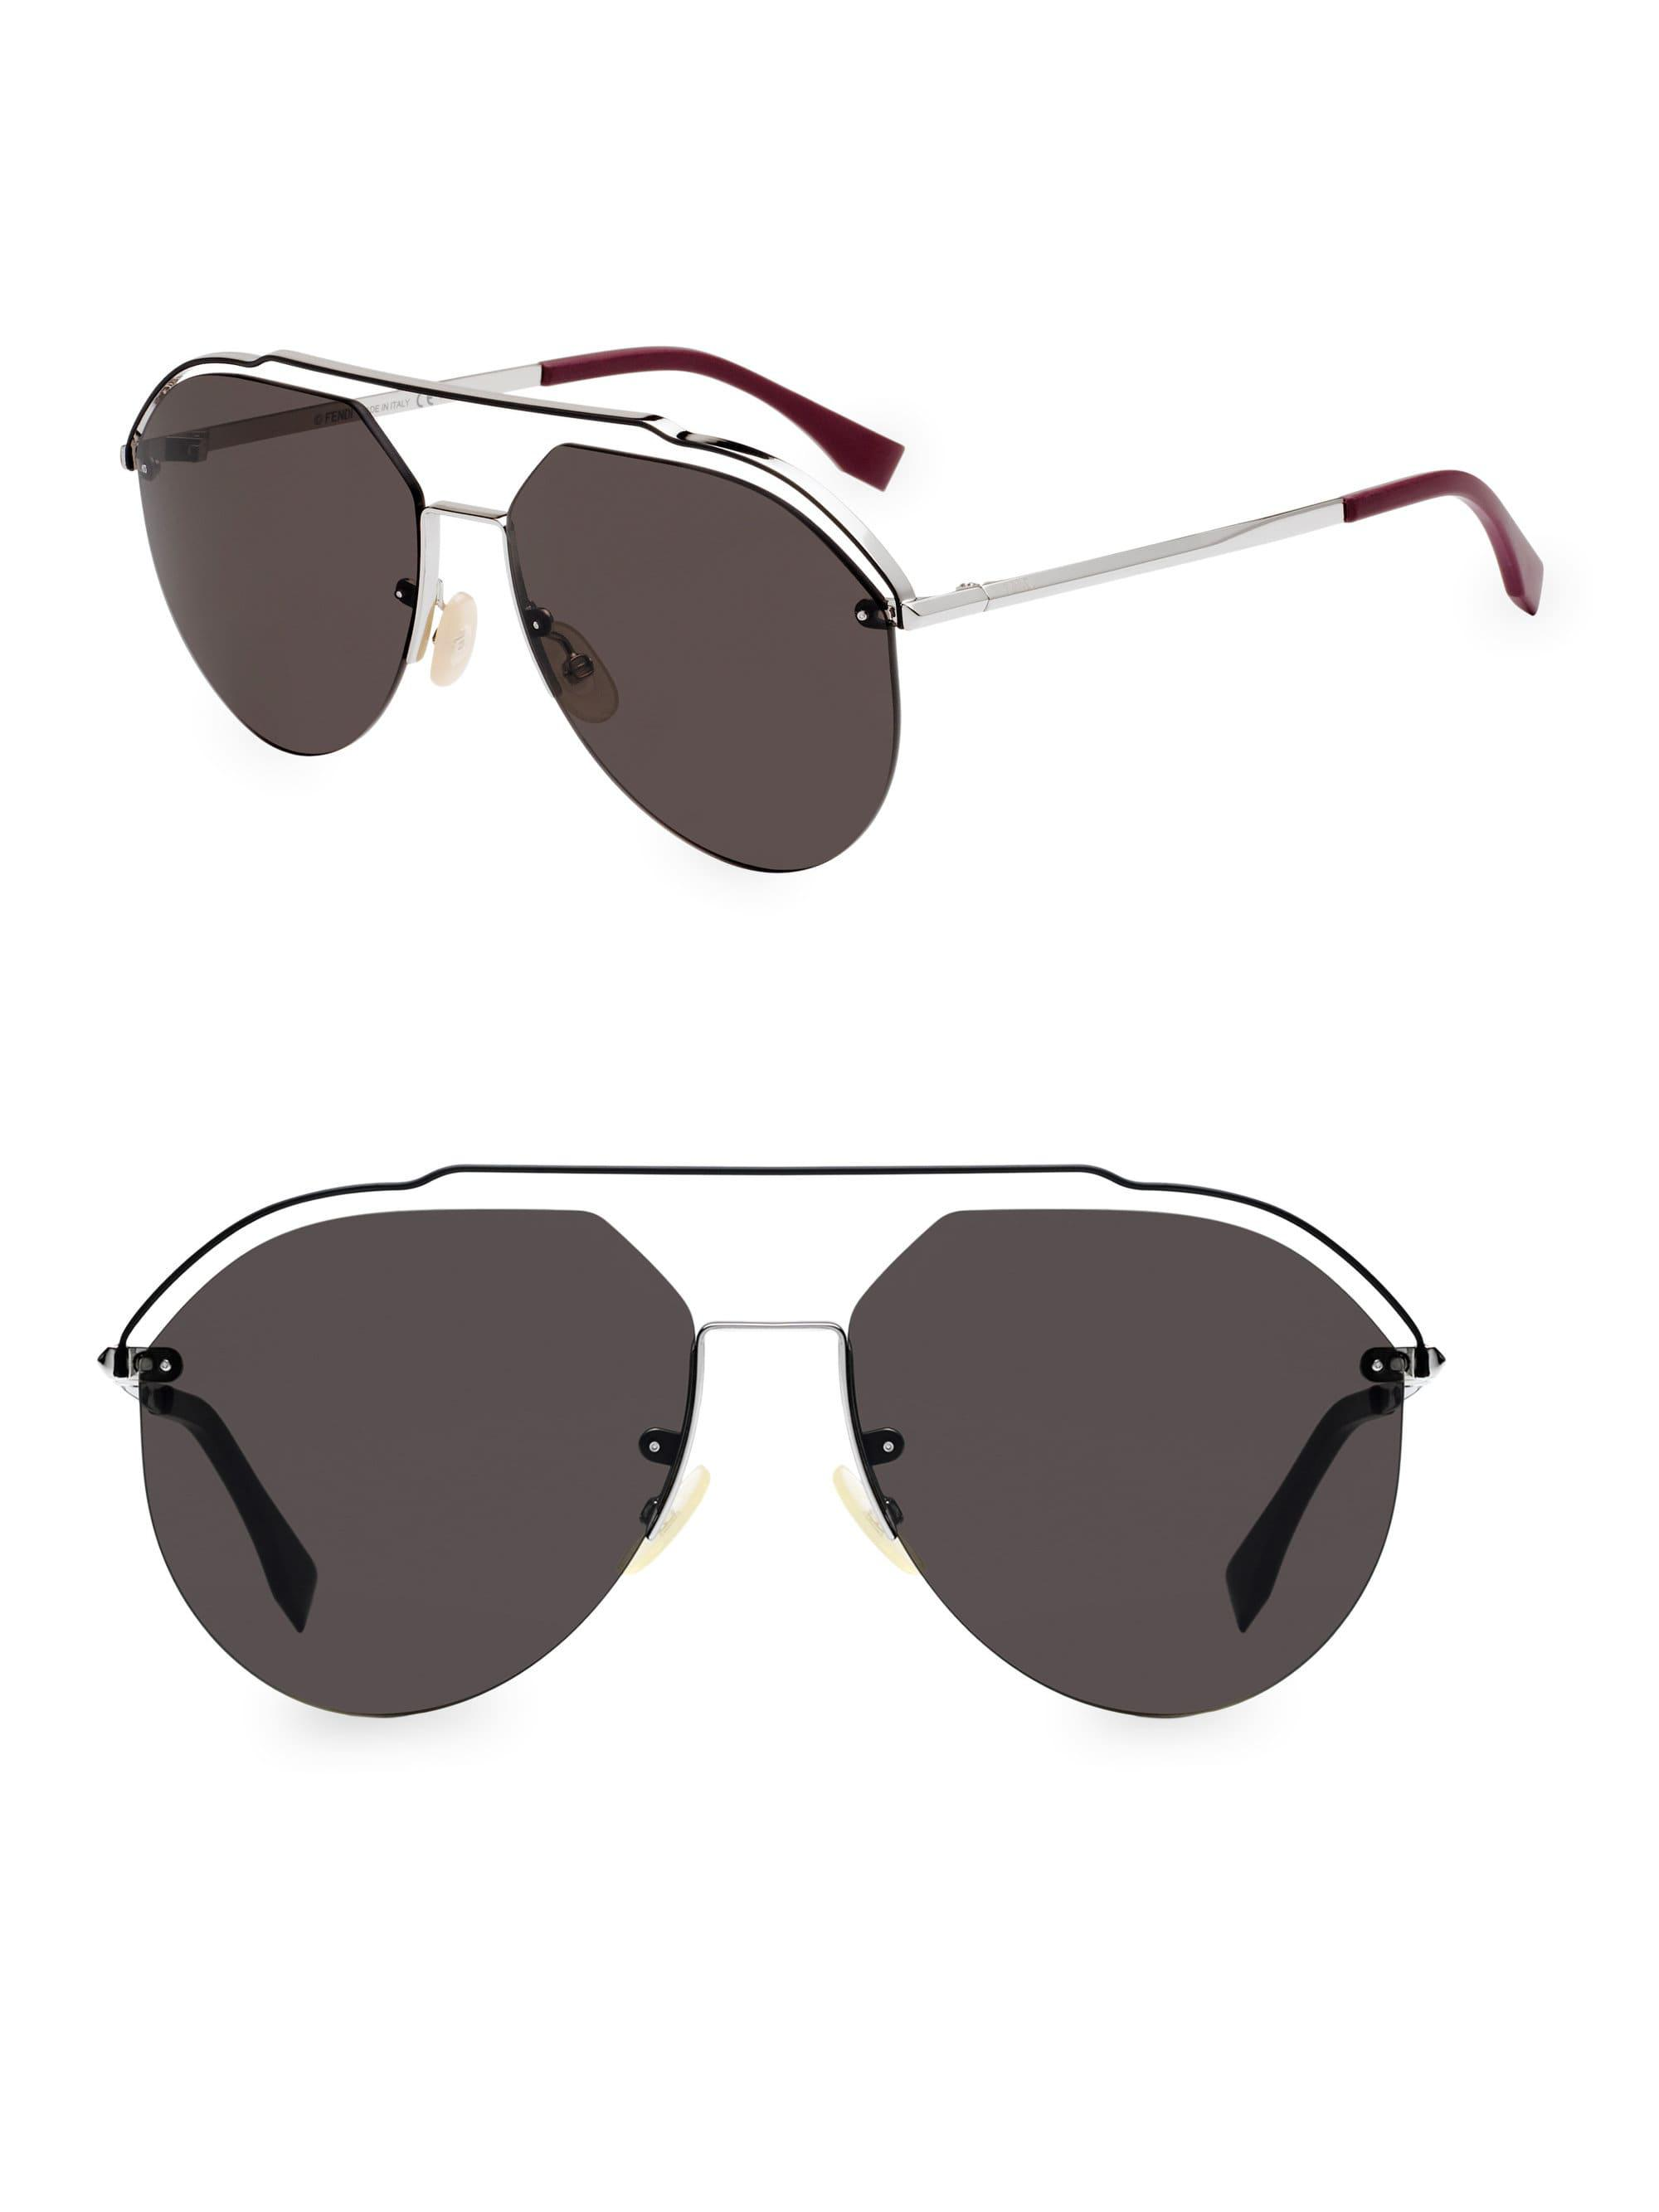 6addb35725c Fendi 61mm Metal Aviator Sunglasses for Men - Lyst